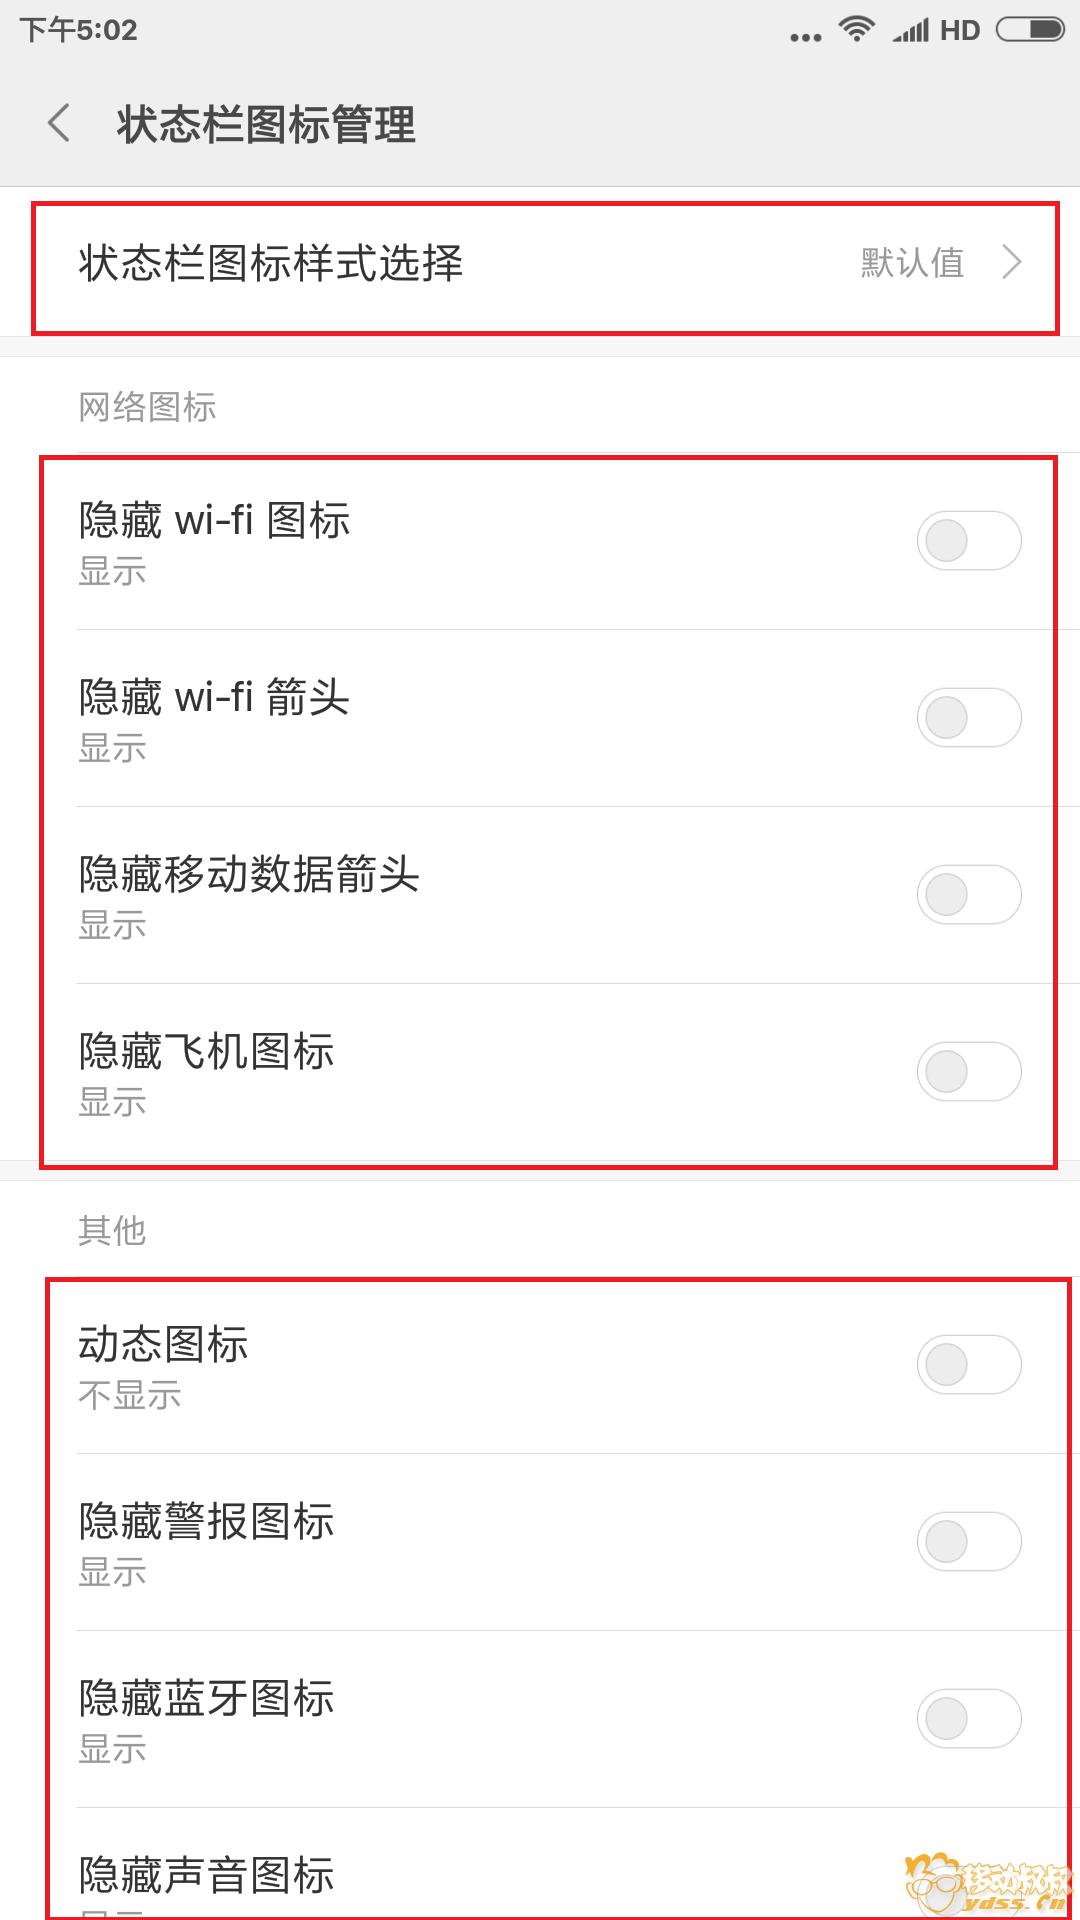 Screenshot_2018-05-19-17-02-34-250_com.android.settings.png